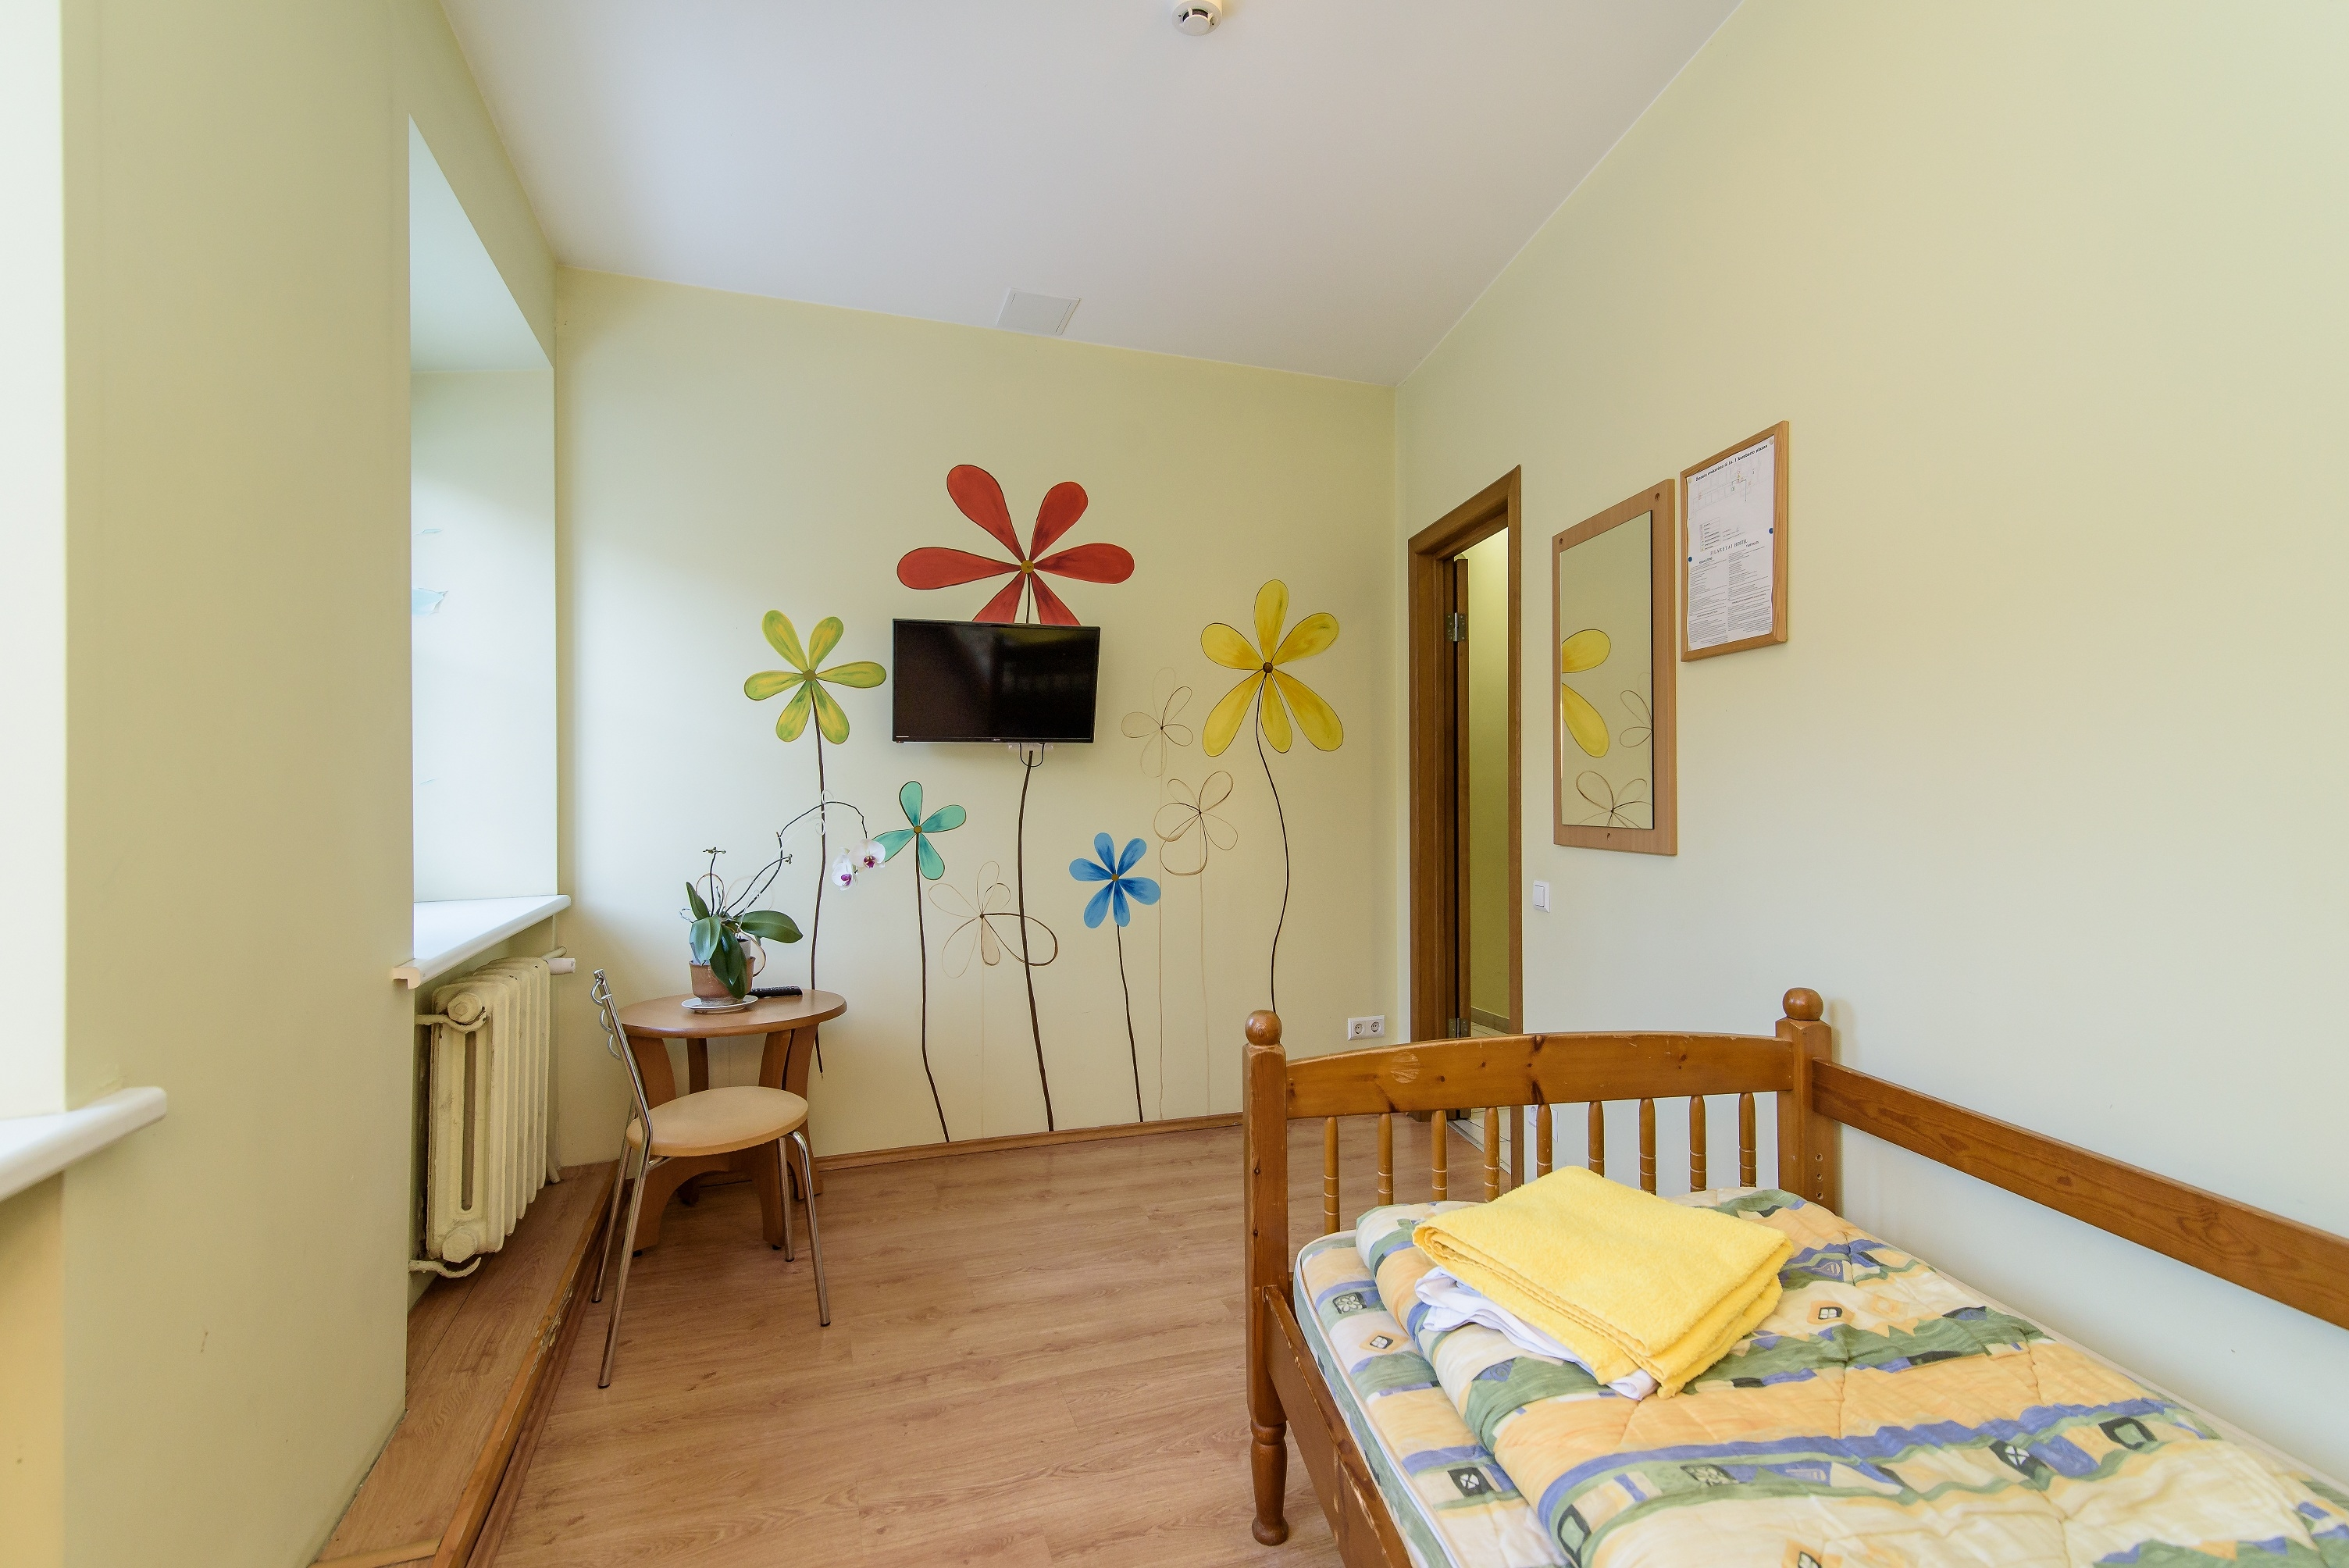 Filaretai hostel